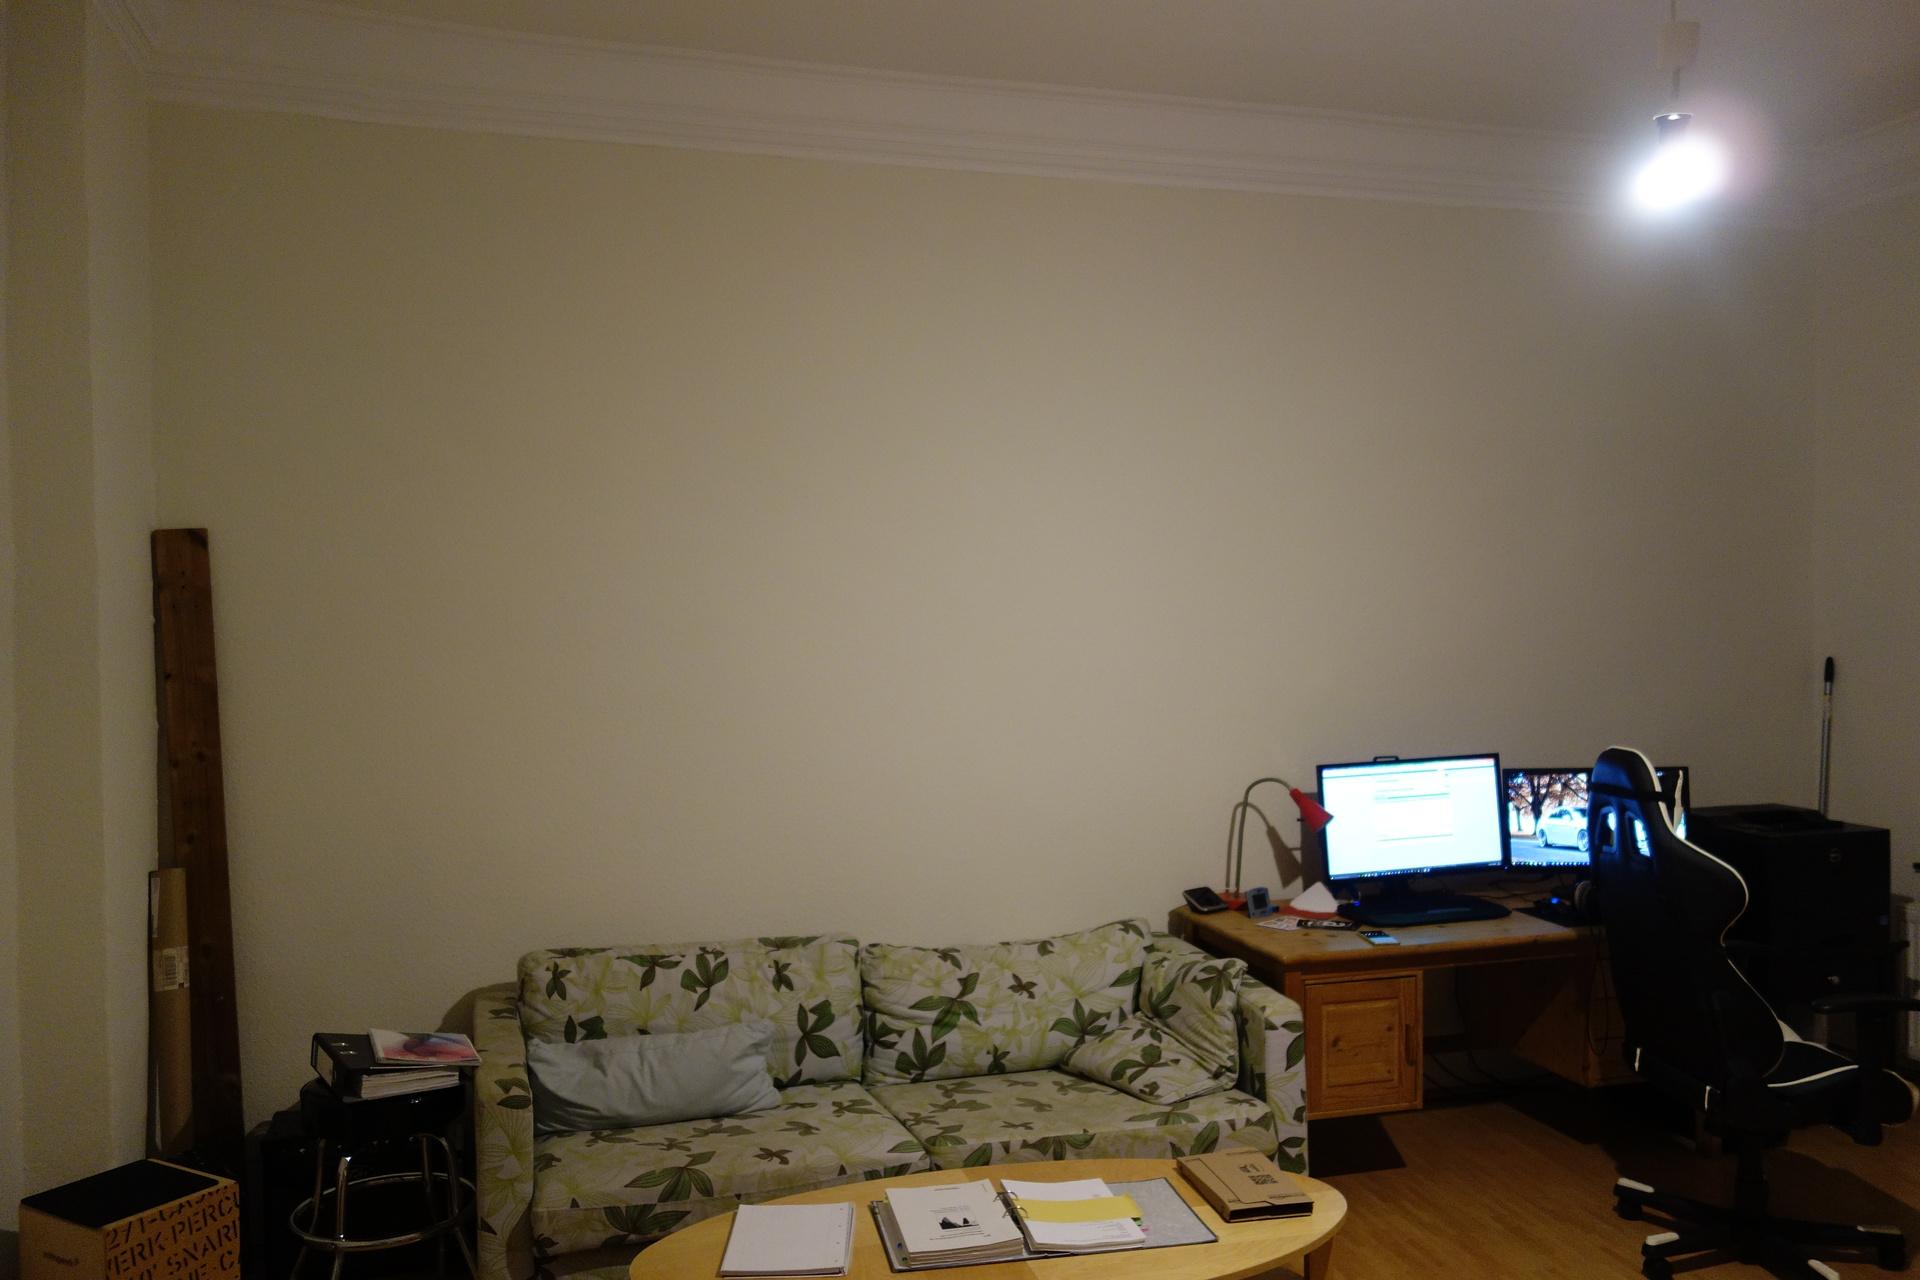 Wand f r leinwand beamer leinwand tv wand hifi bildergalerie - Leinwand fur wohnzimmer ...